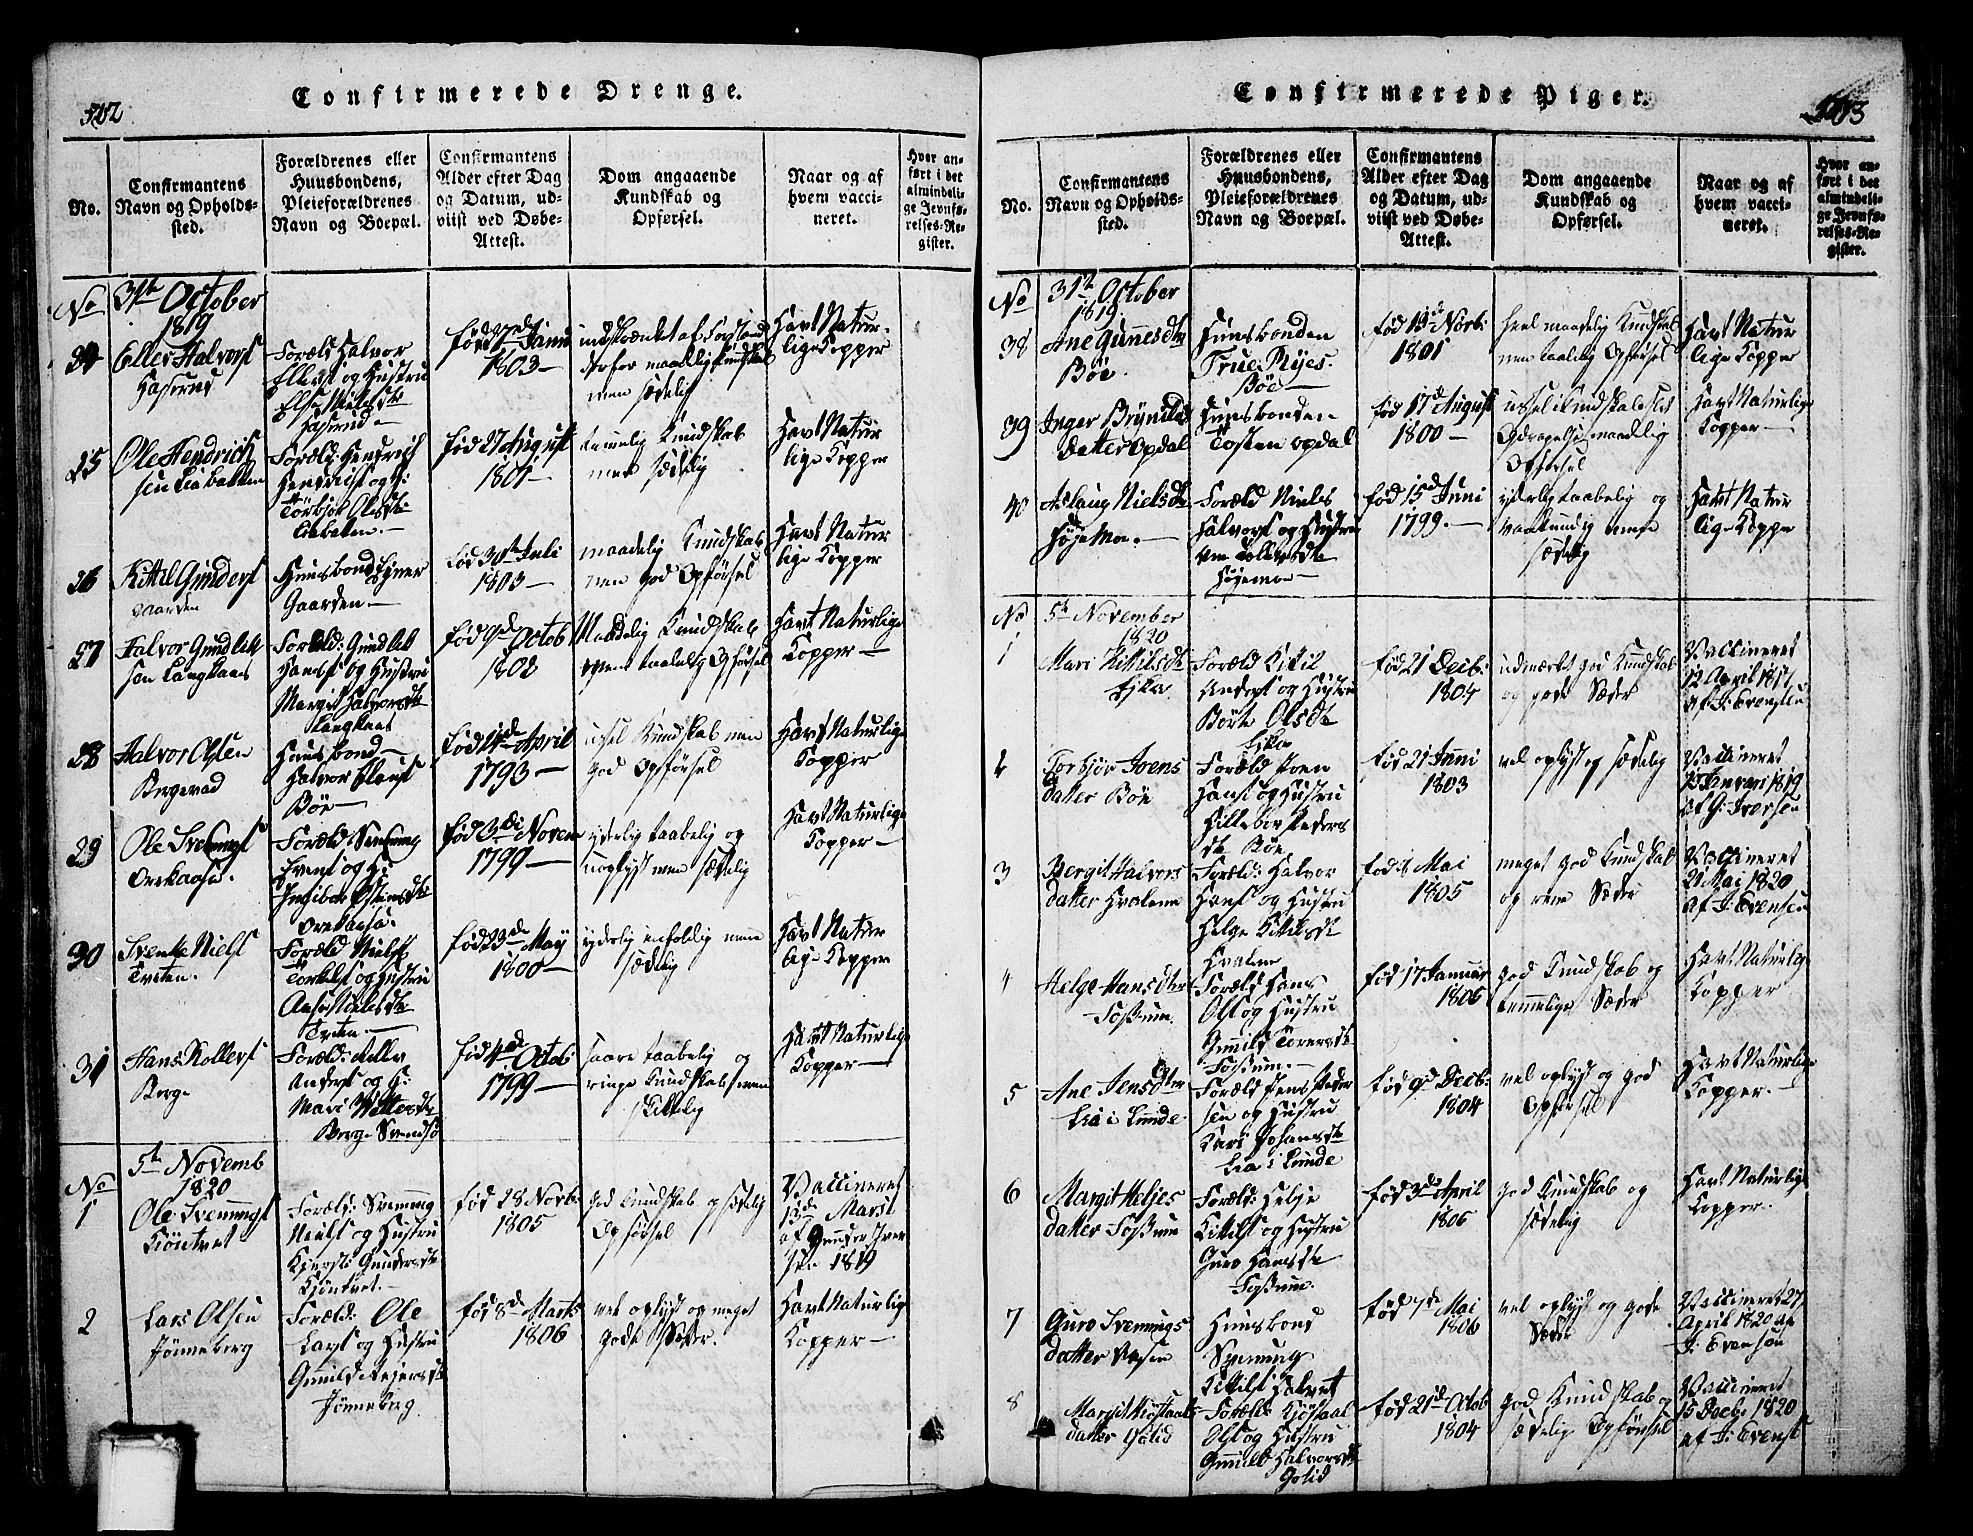 SAKO, Bø kirkebøker, G/Ga/L0001: Klokkerbok nr. 1, 1815-1831, s. 502-503